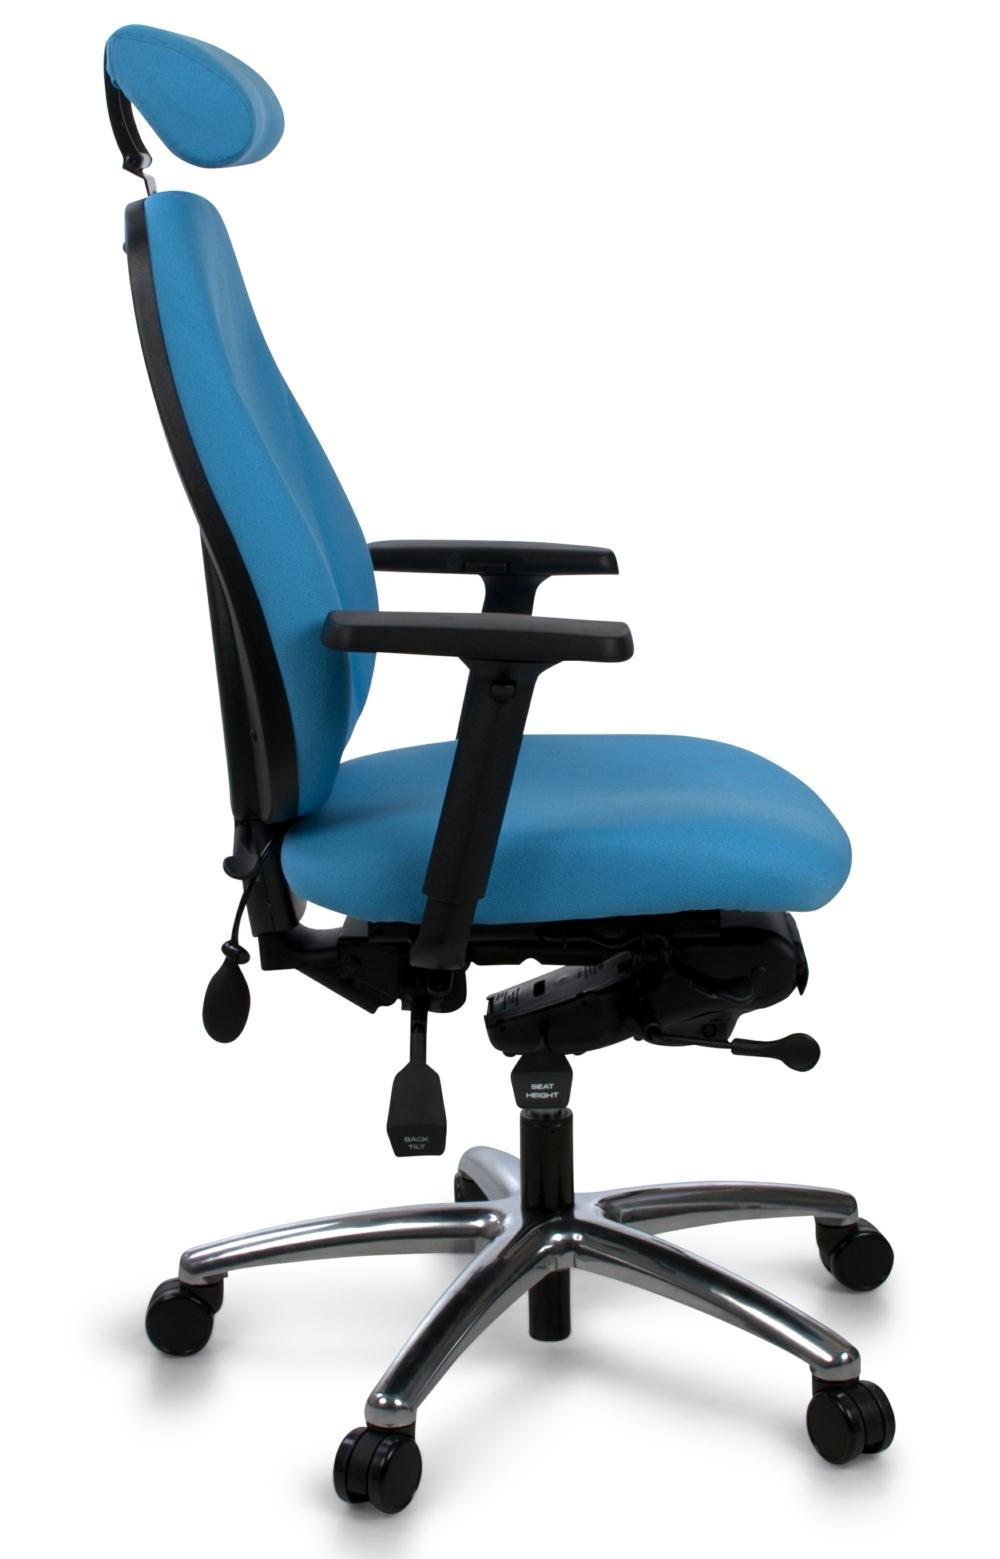 36b6277532c Opera 20-6 Ergonomic Office Chair